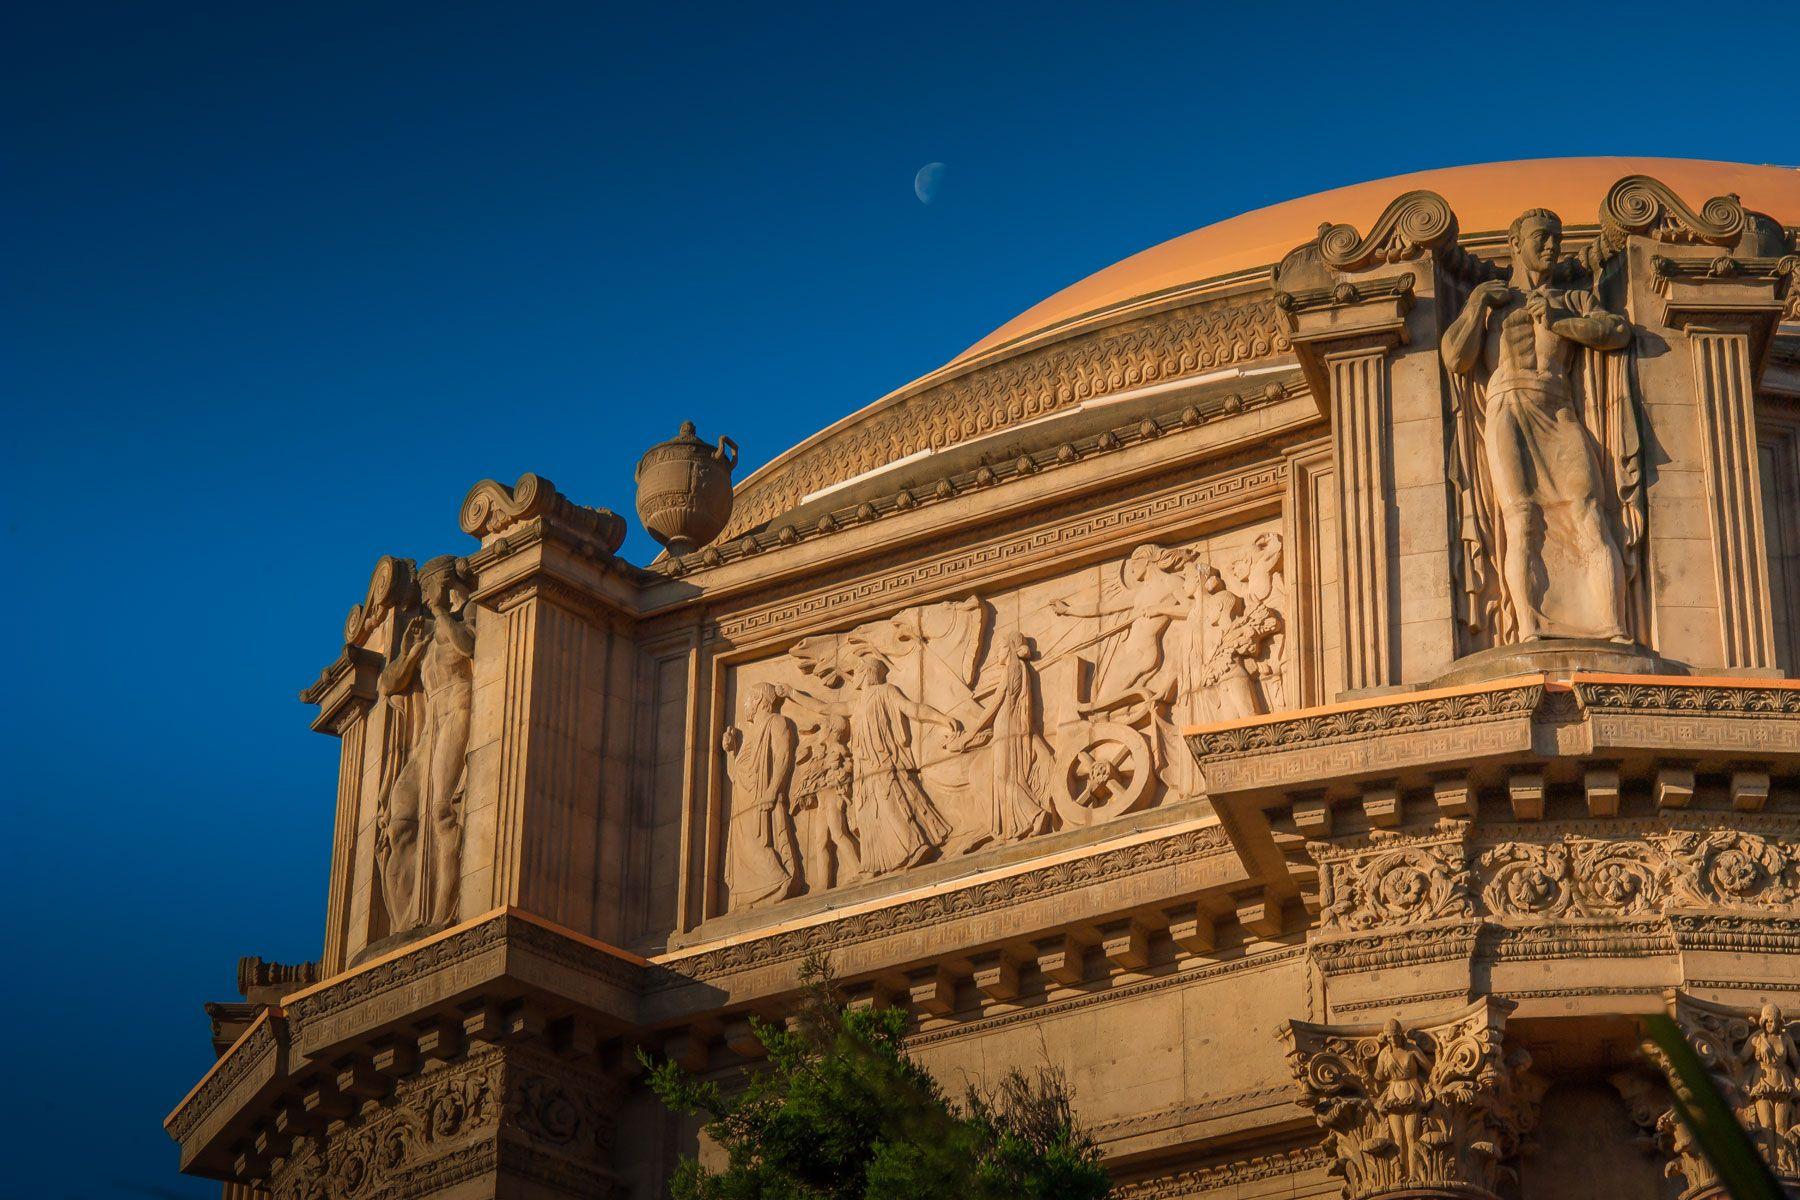 Palace of Fine Arts, CA